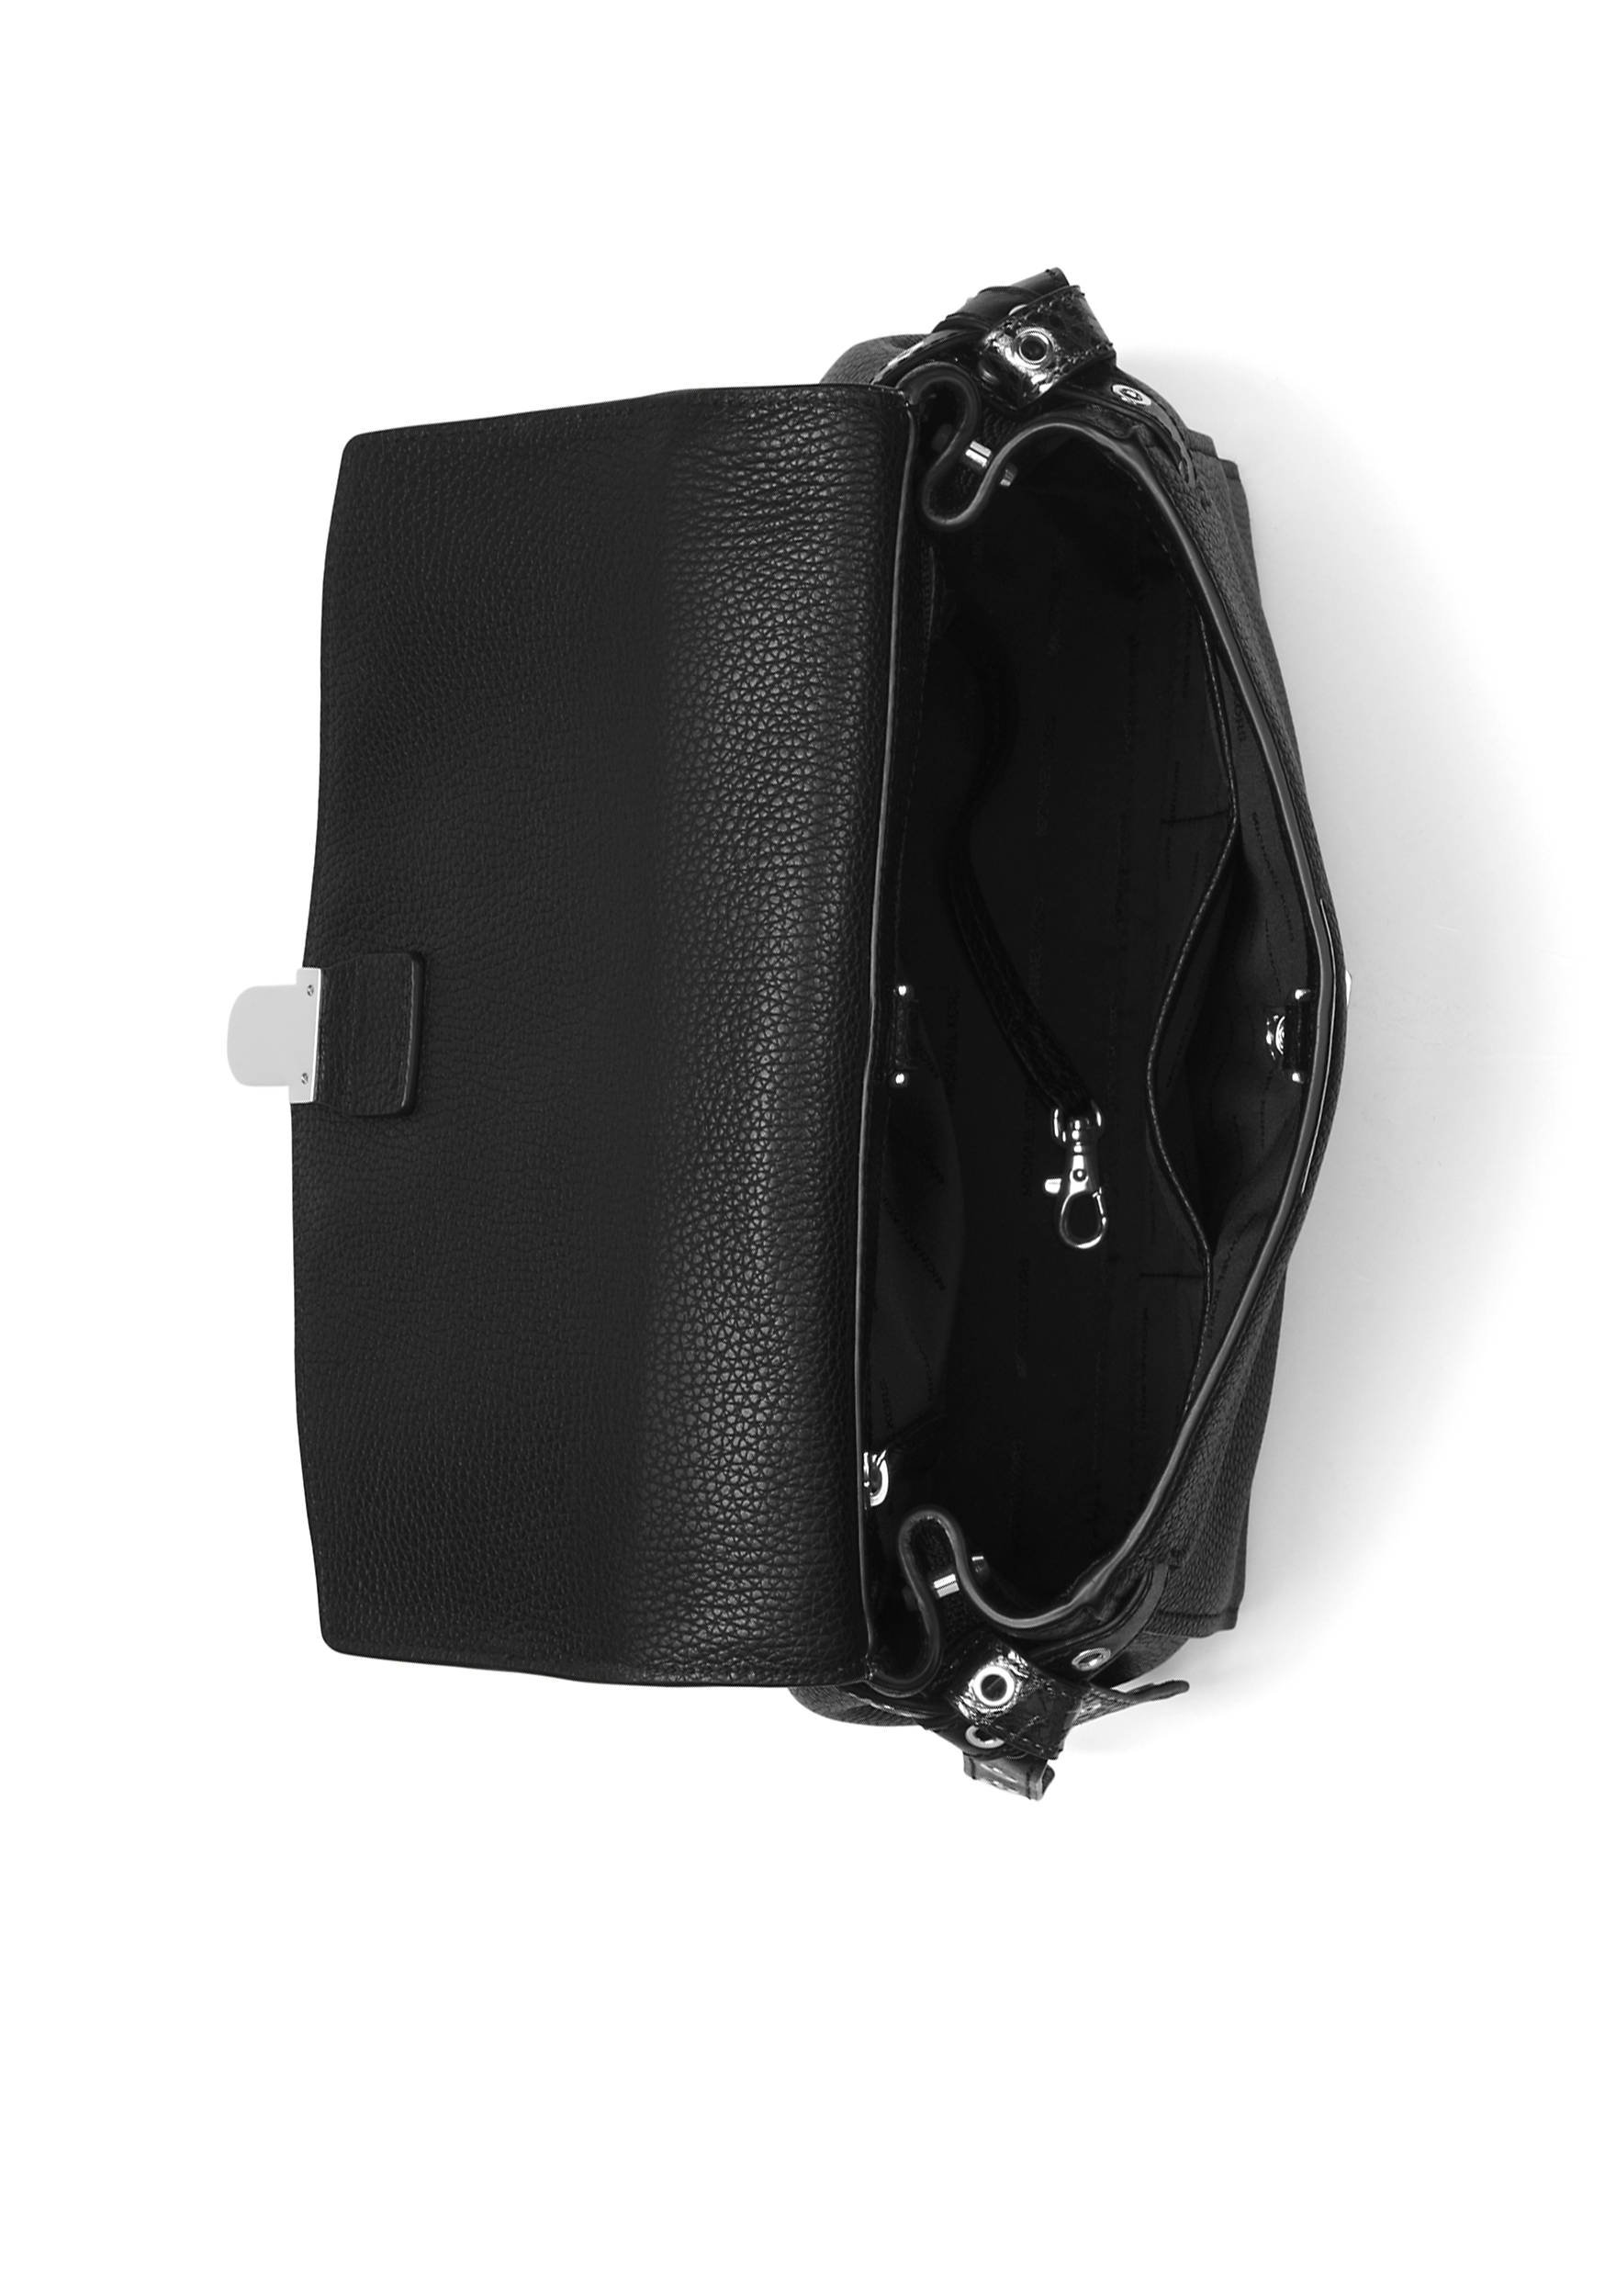 MICHAEL Michael Kors Bristol Metallic Embossed-Leather Satchel , Black Pewter by MICHAEL Michael Kors (Image #6)